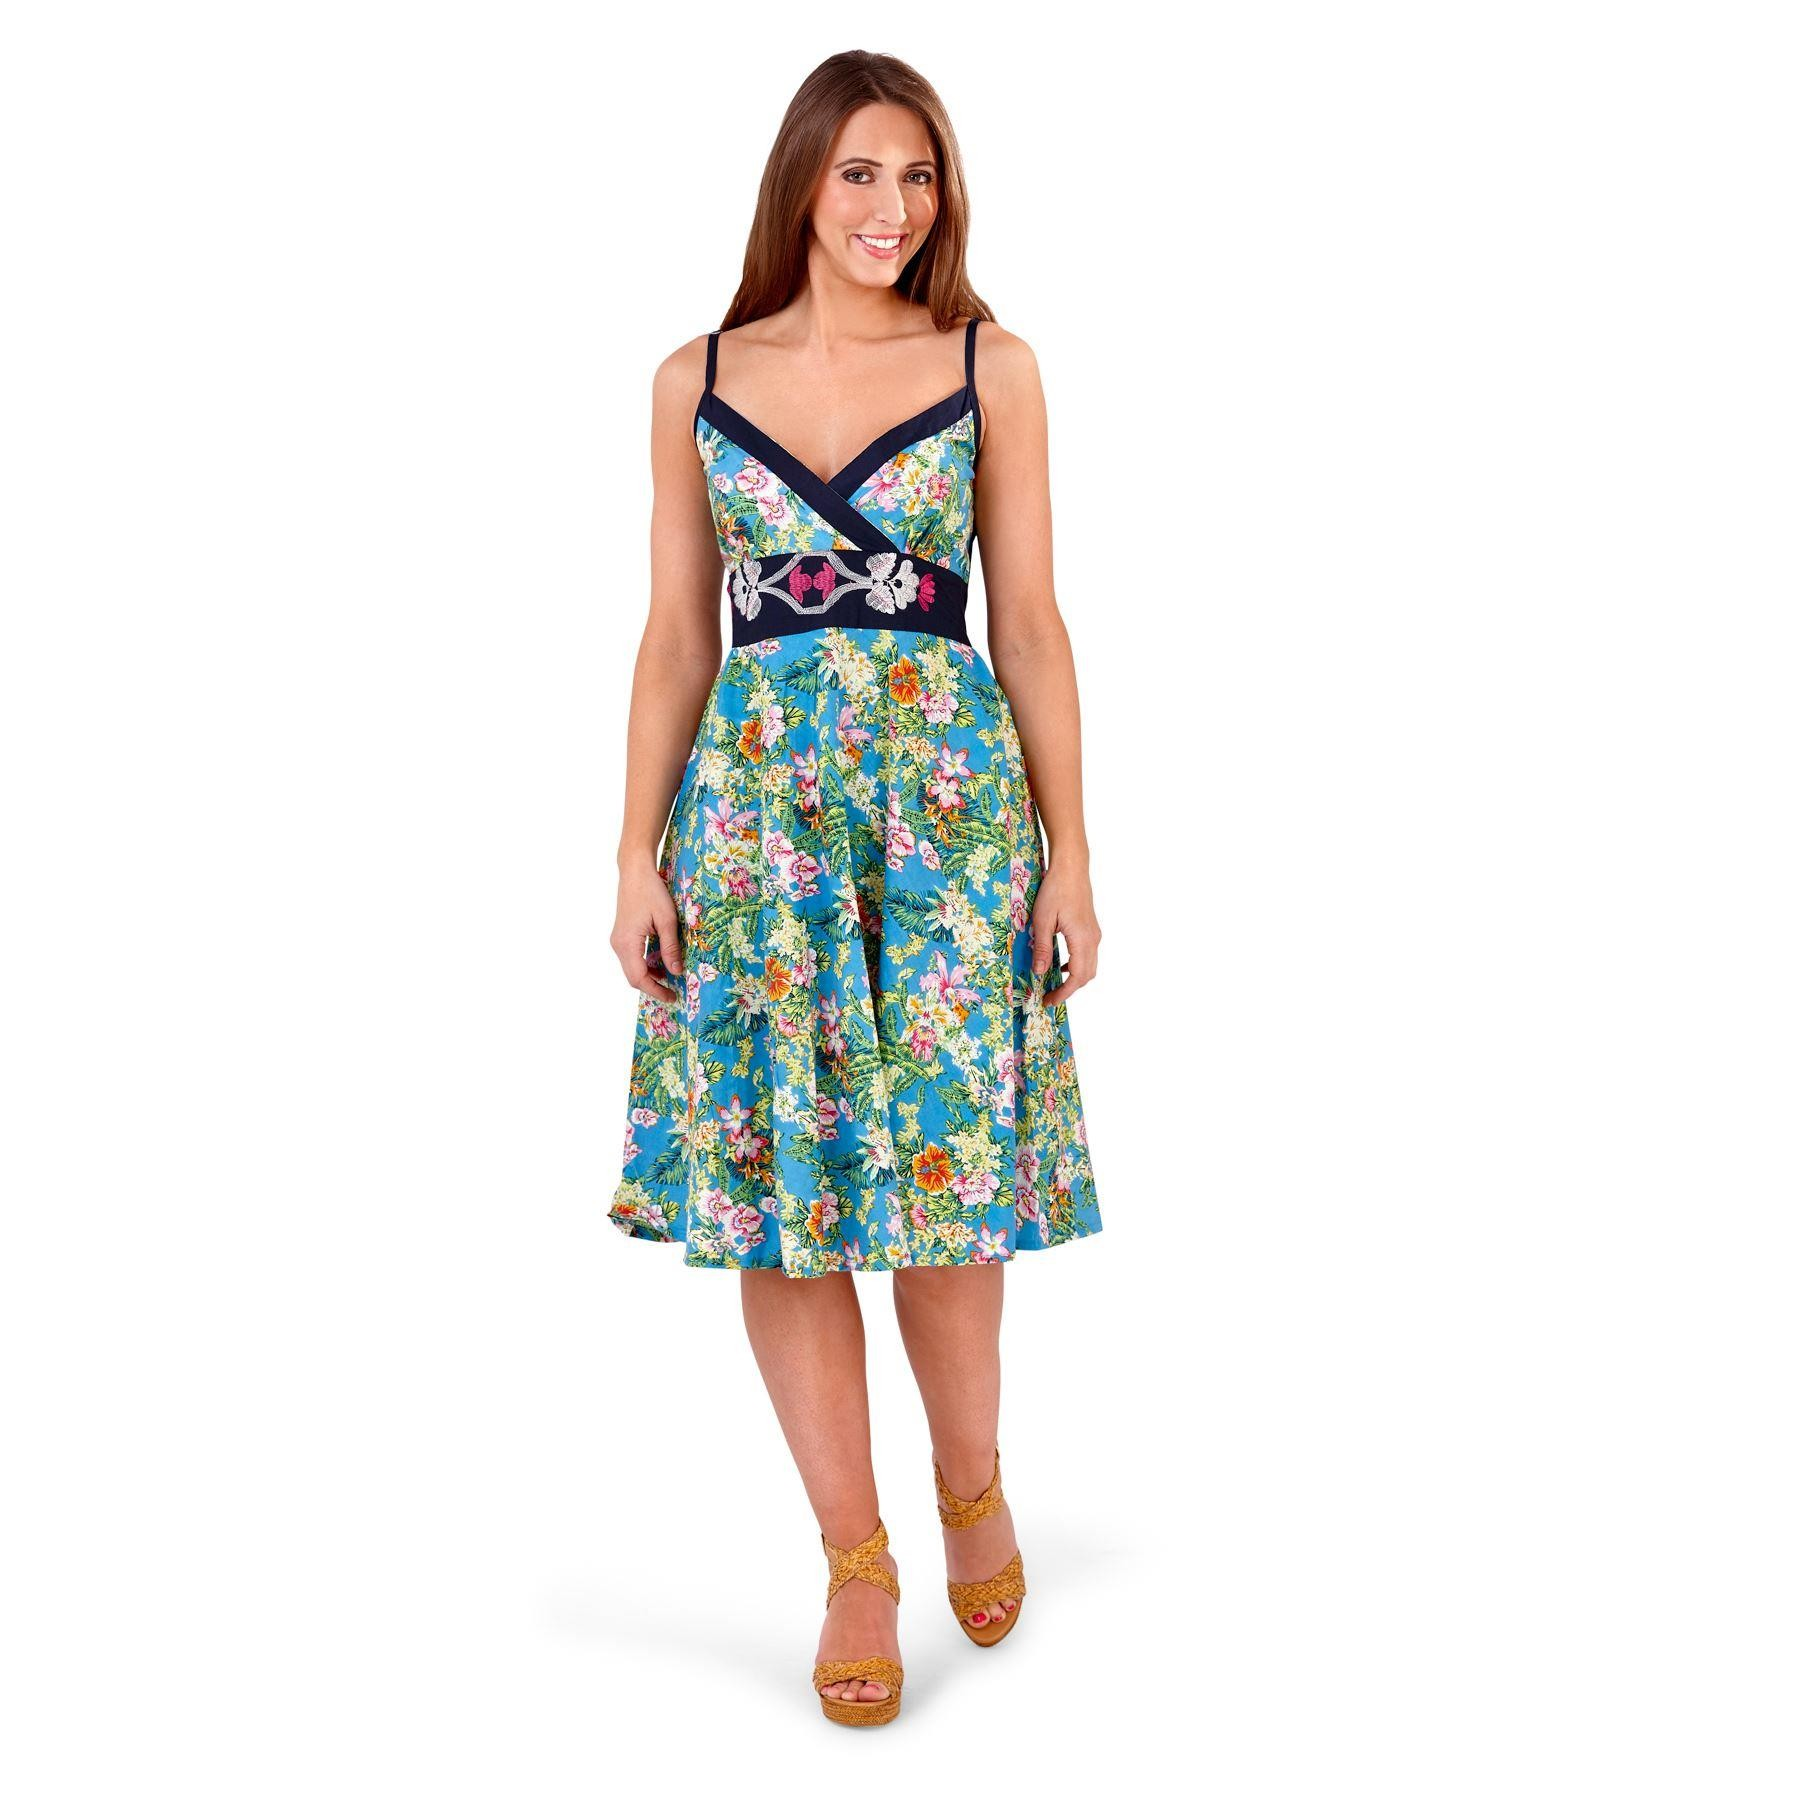 Pistachio Floral Crossover Dress - Blue/Navy